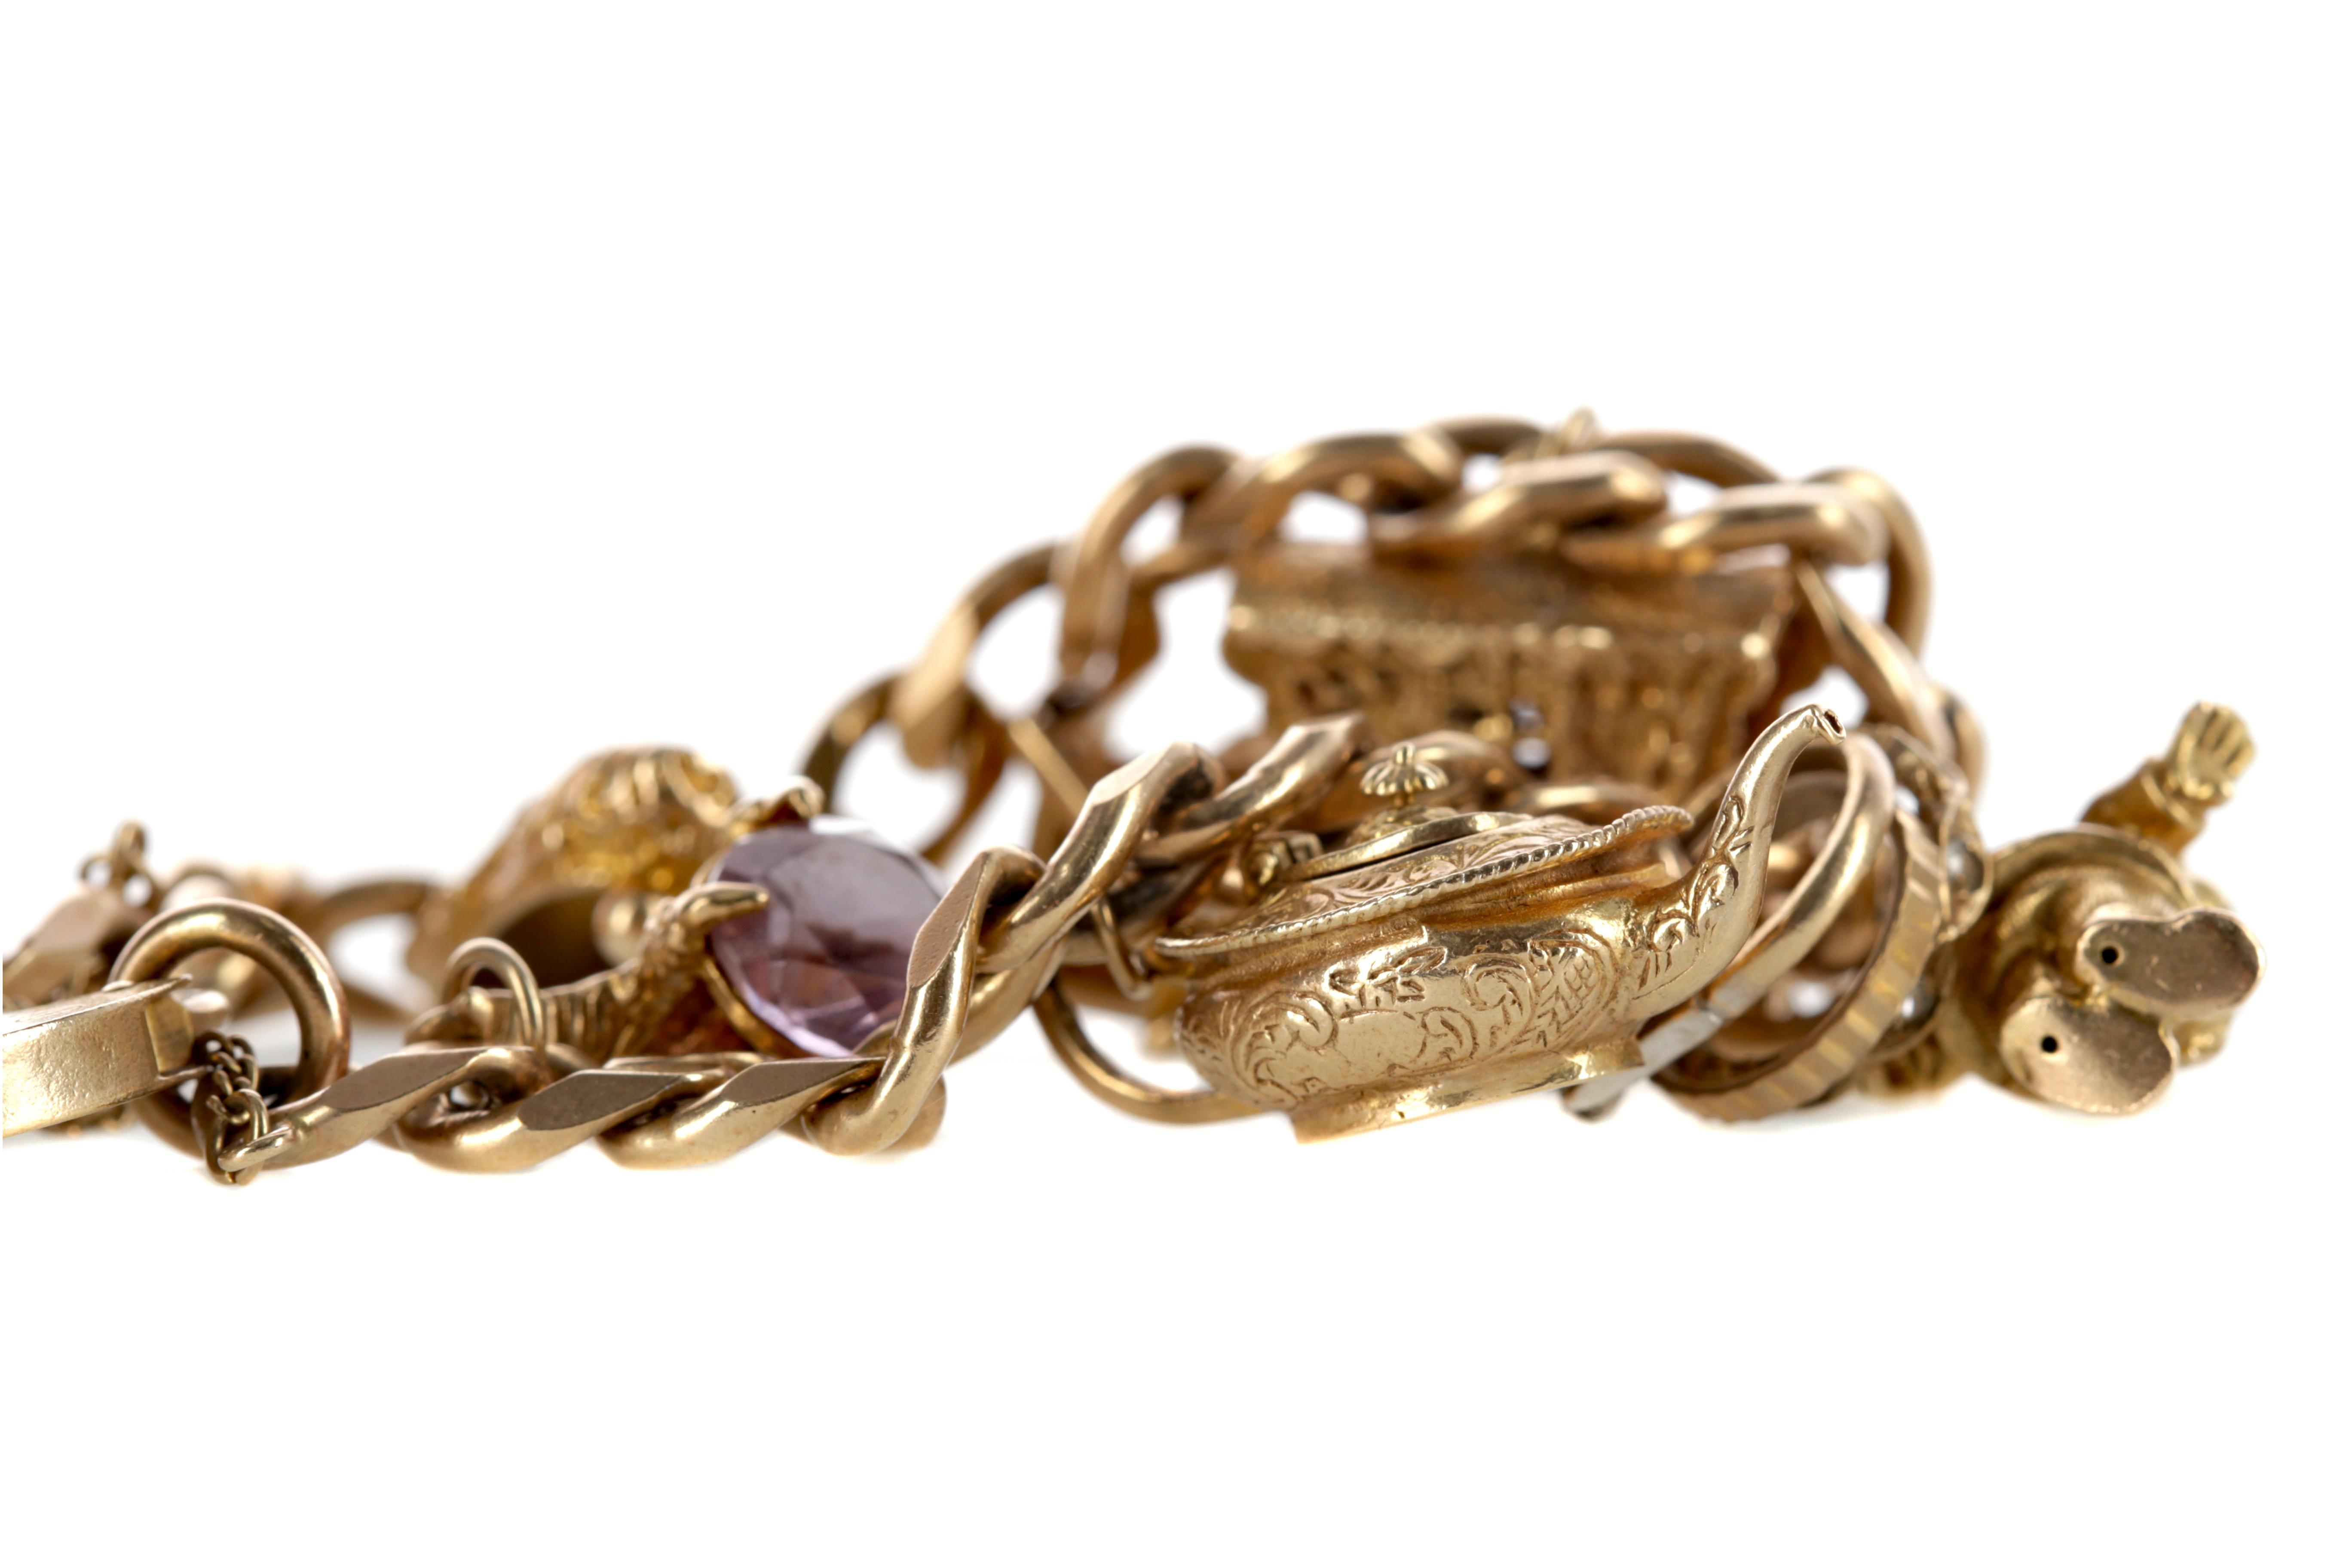 A GOLD CHARM BRACELET - Image 2 of 3